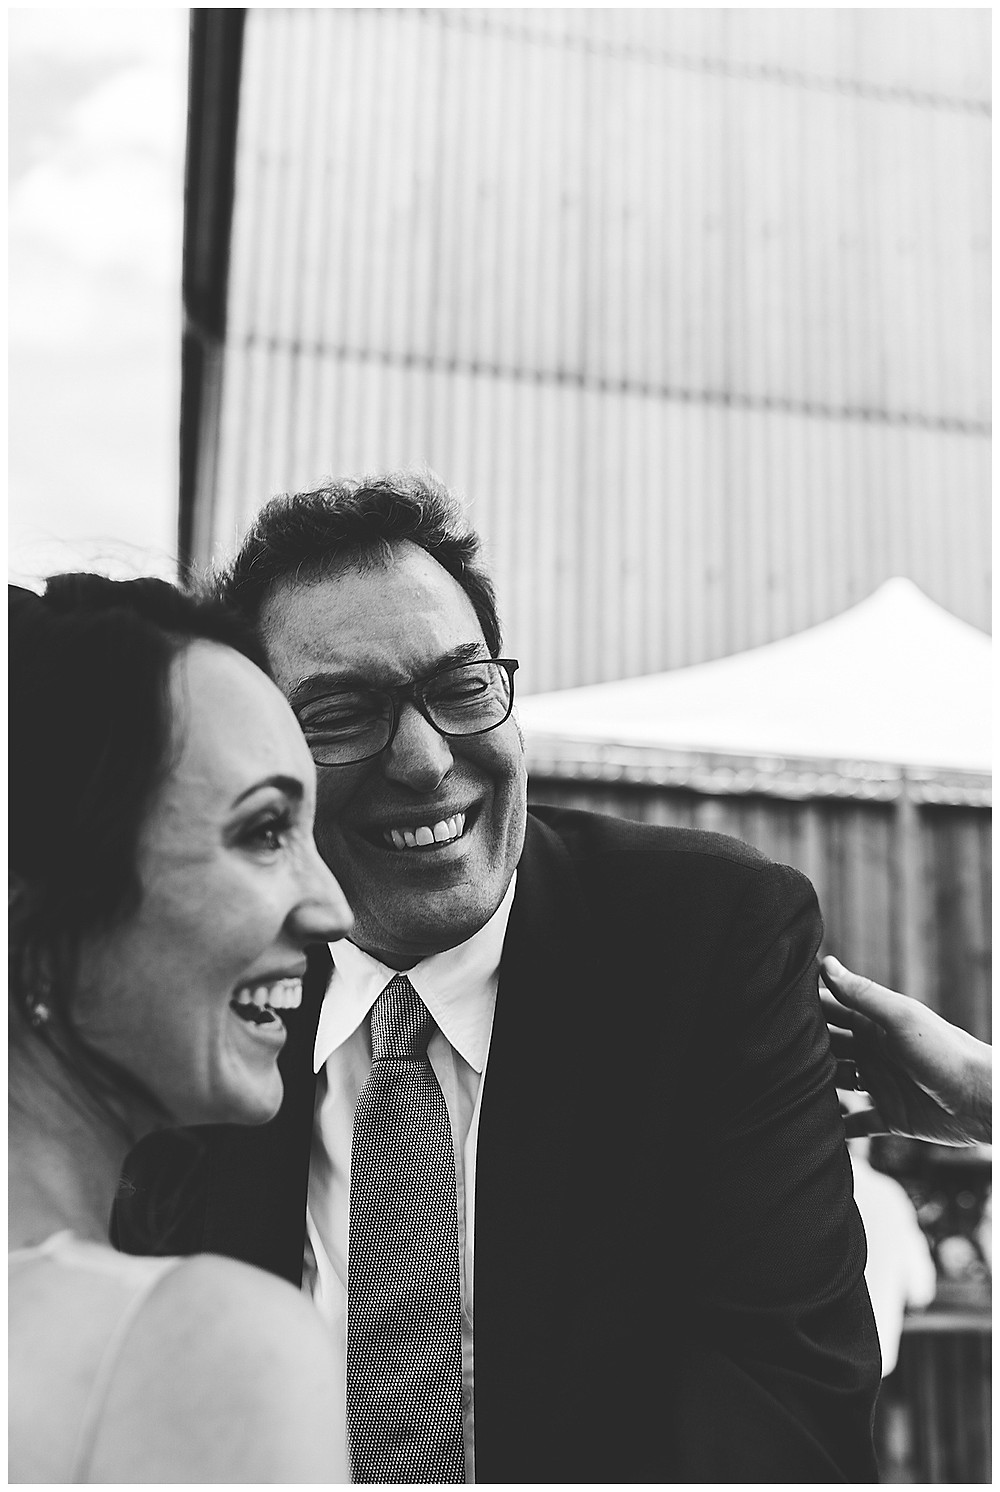 Papa gratuliert seiner Tochter an Hochzeit lacht